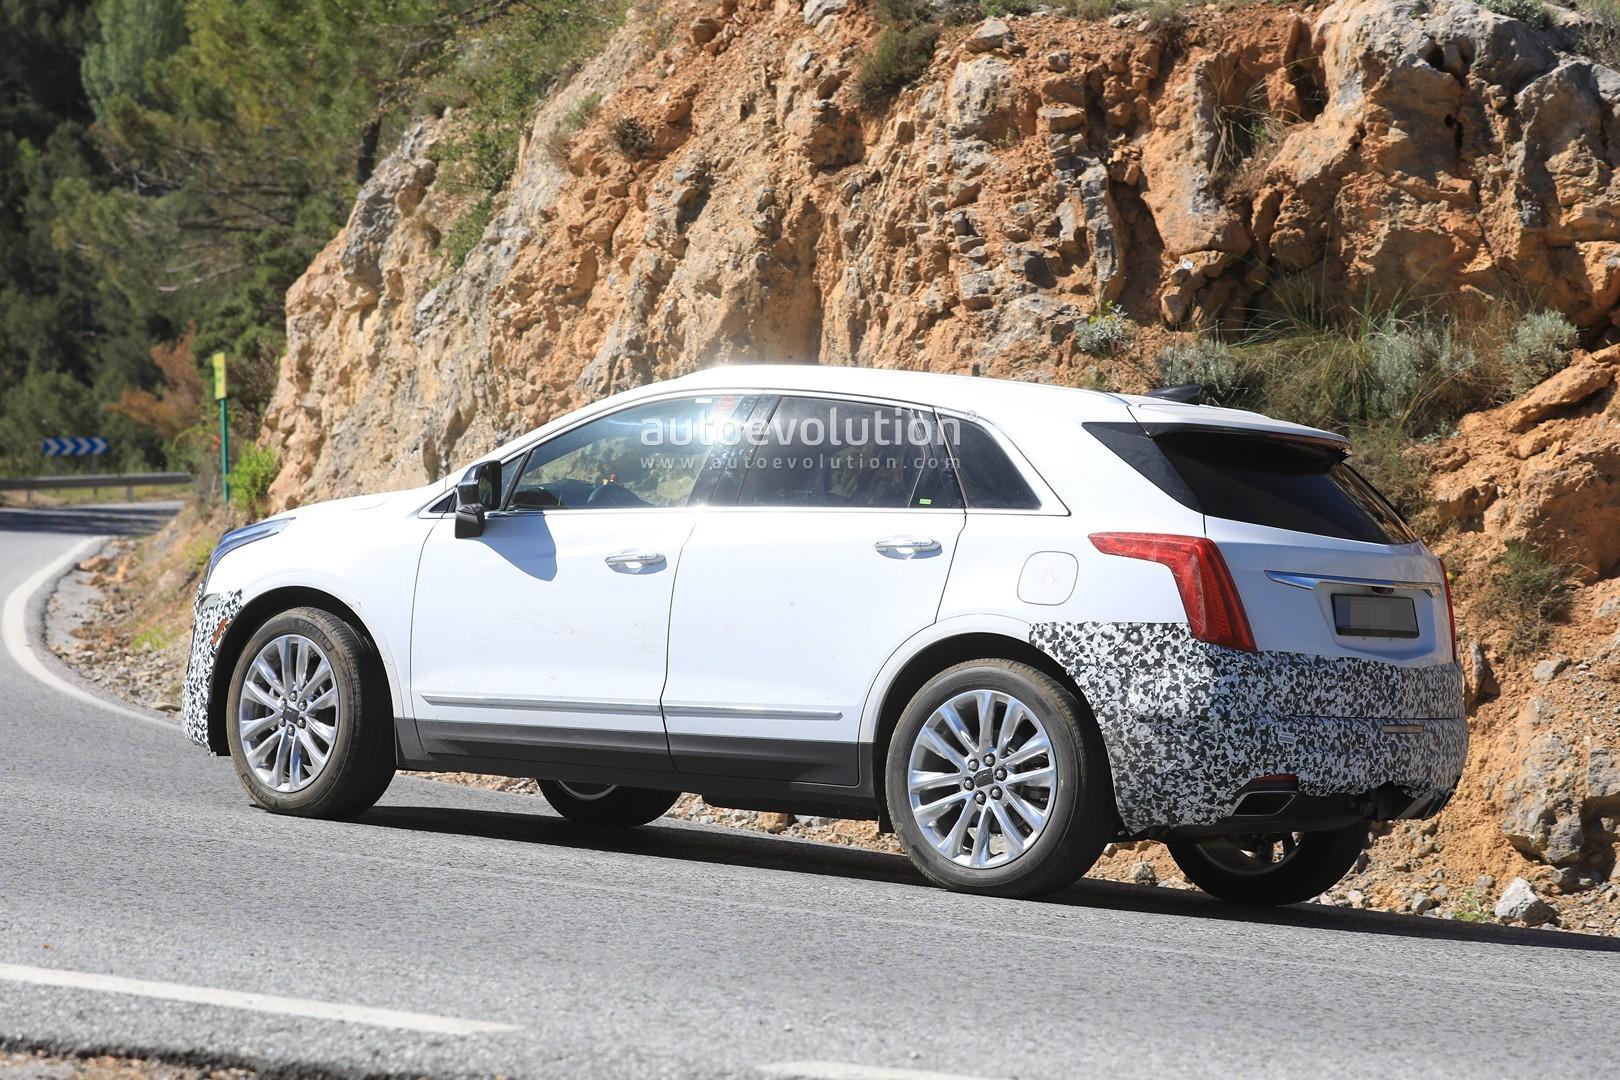 Spyshots: 2020 Cadillac XT5 Facelift Prototype Caught in ...